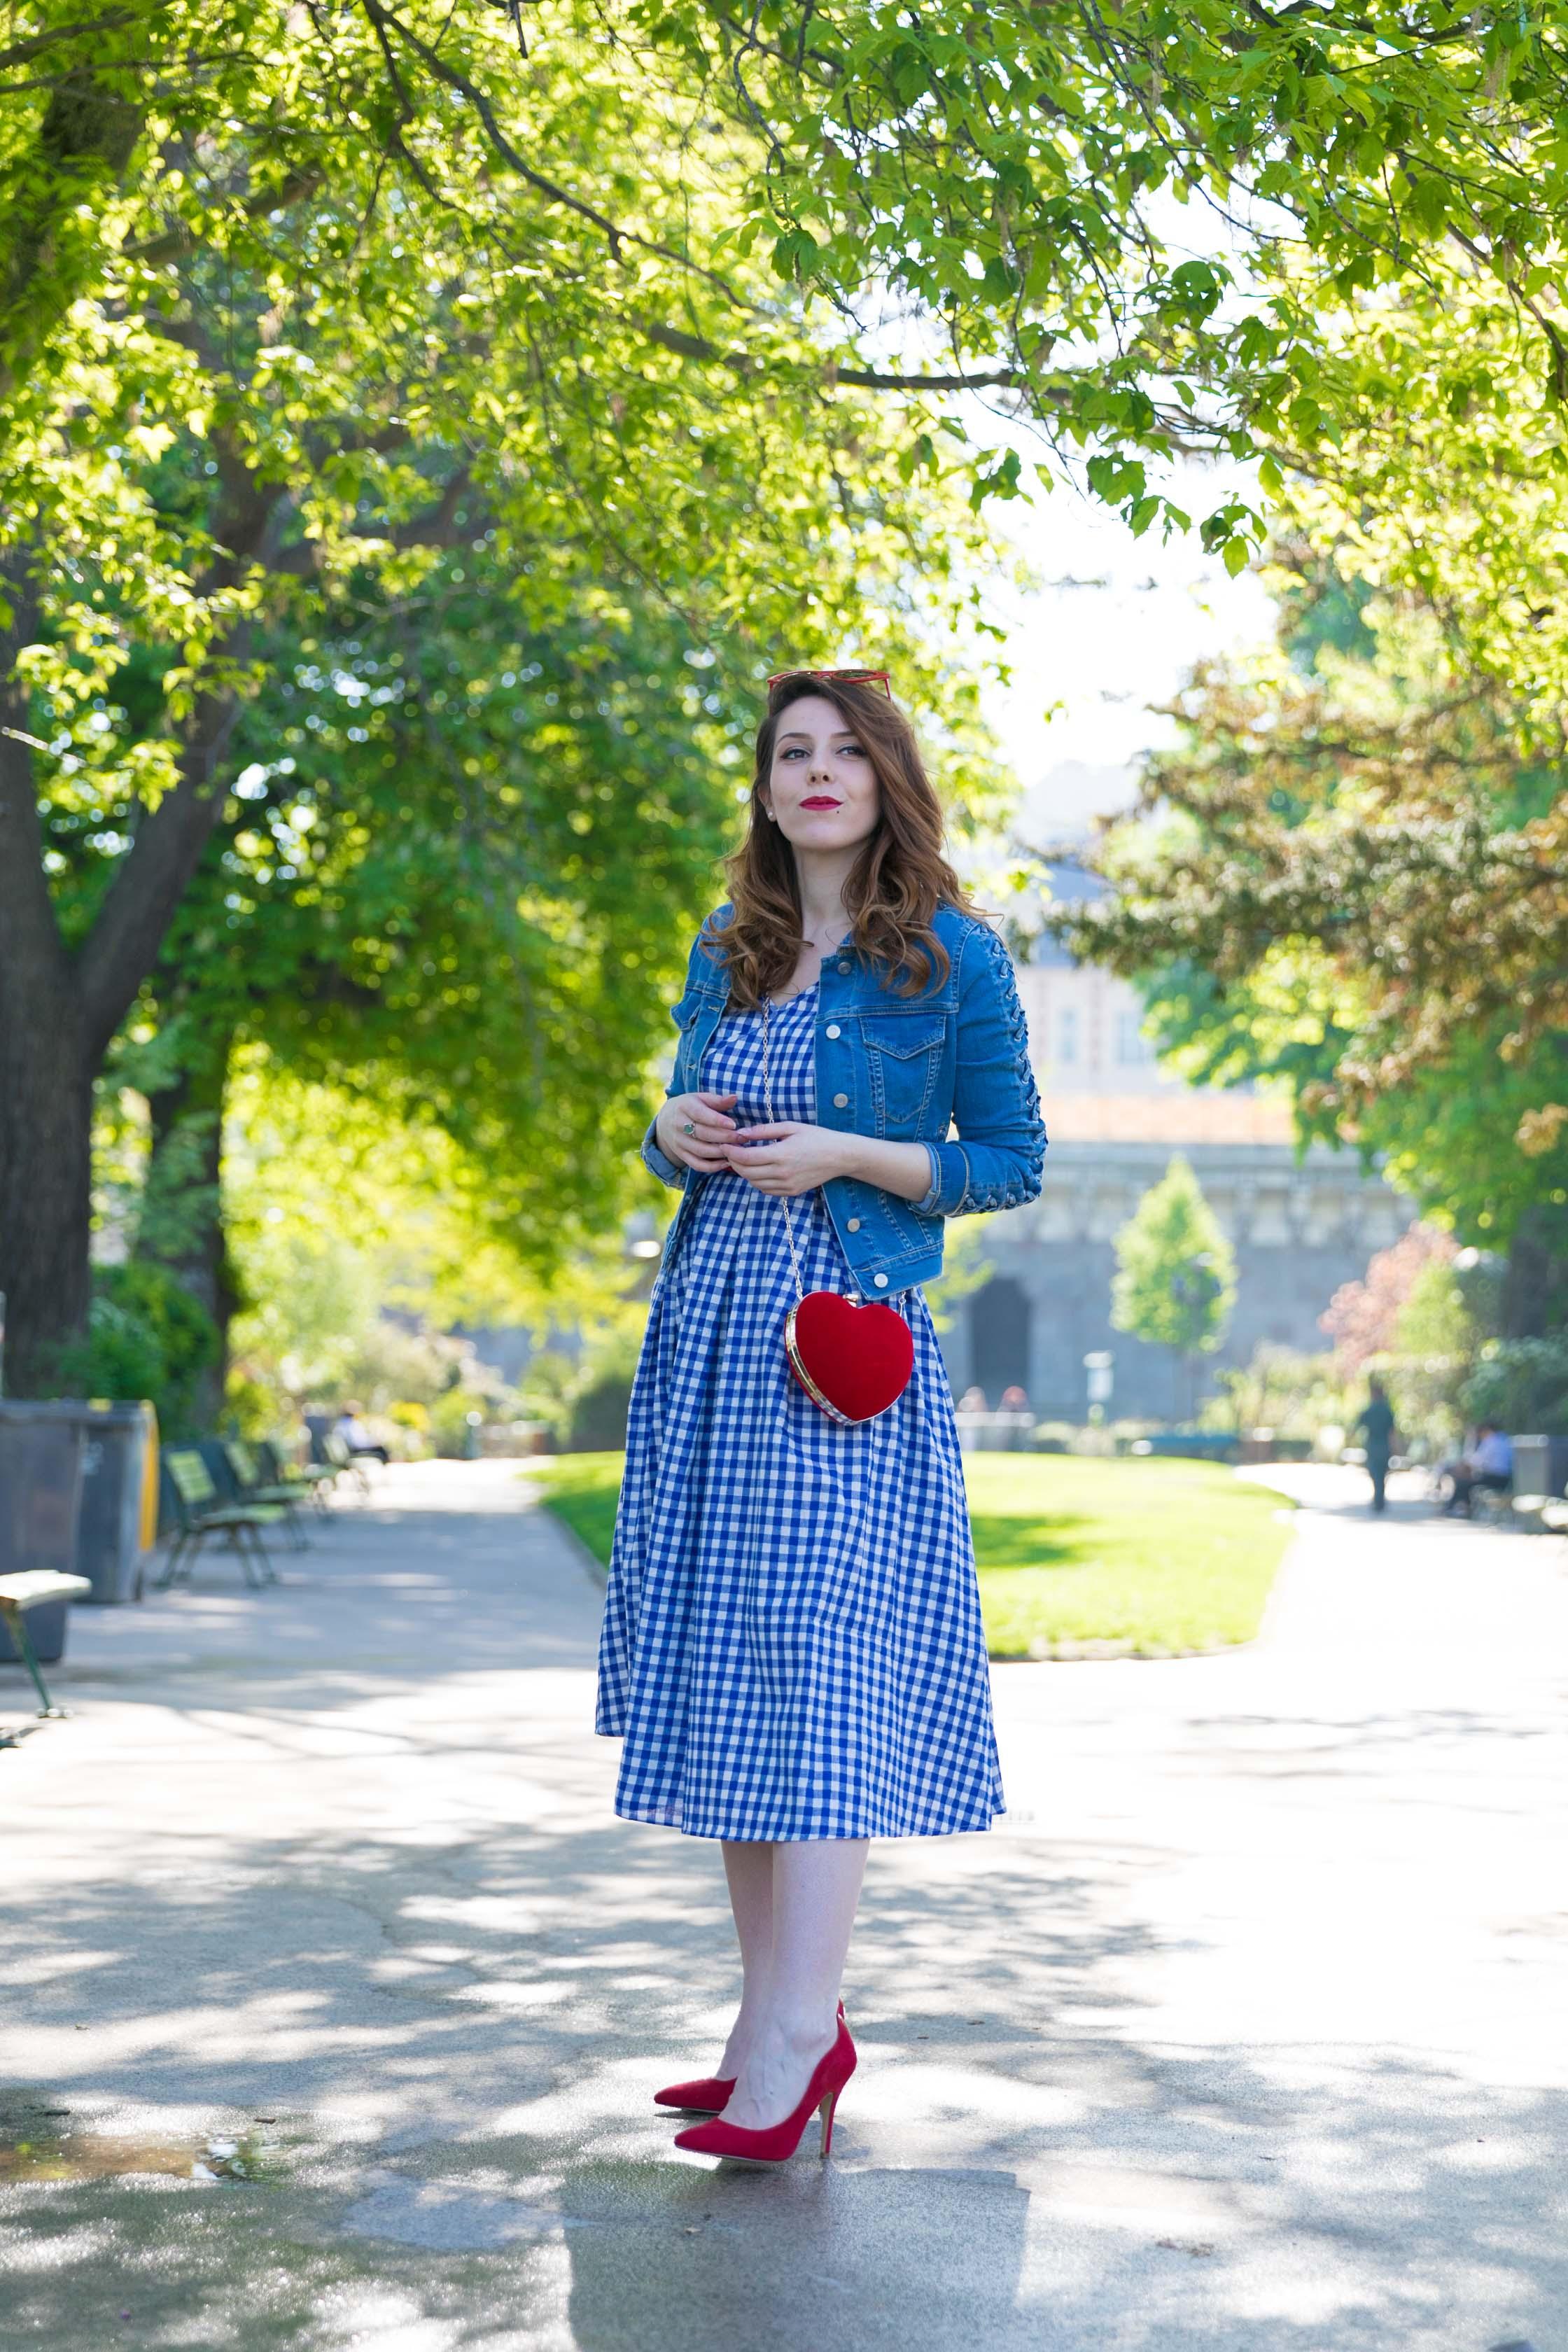 sac coeur rouge robe retro vichy bleue veste en jean tresse ile de la cite paris charlie sugar town